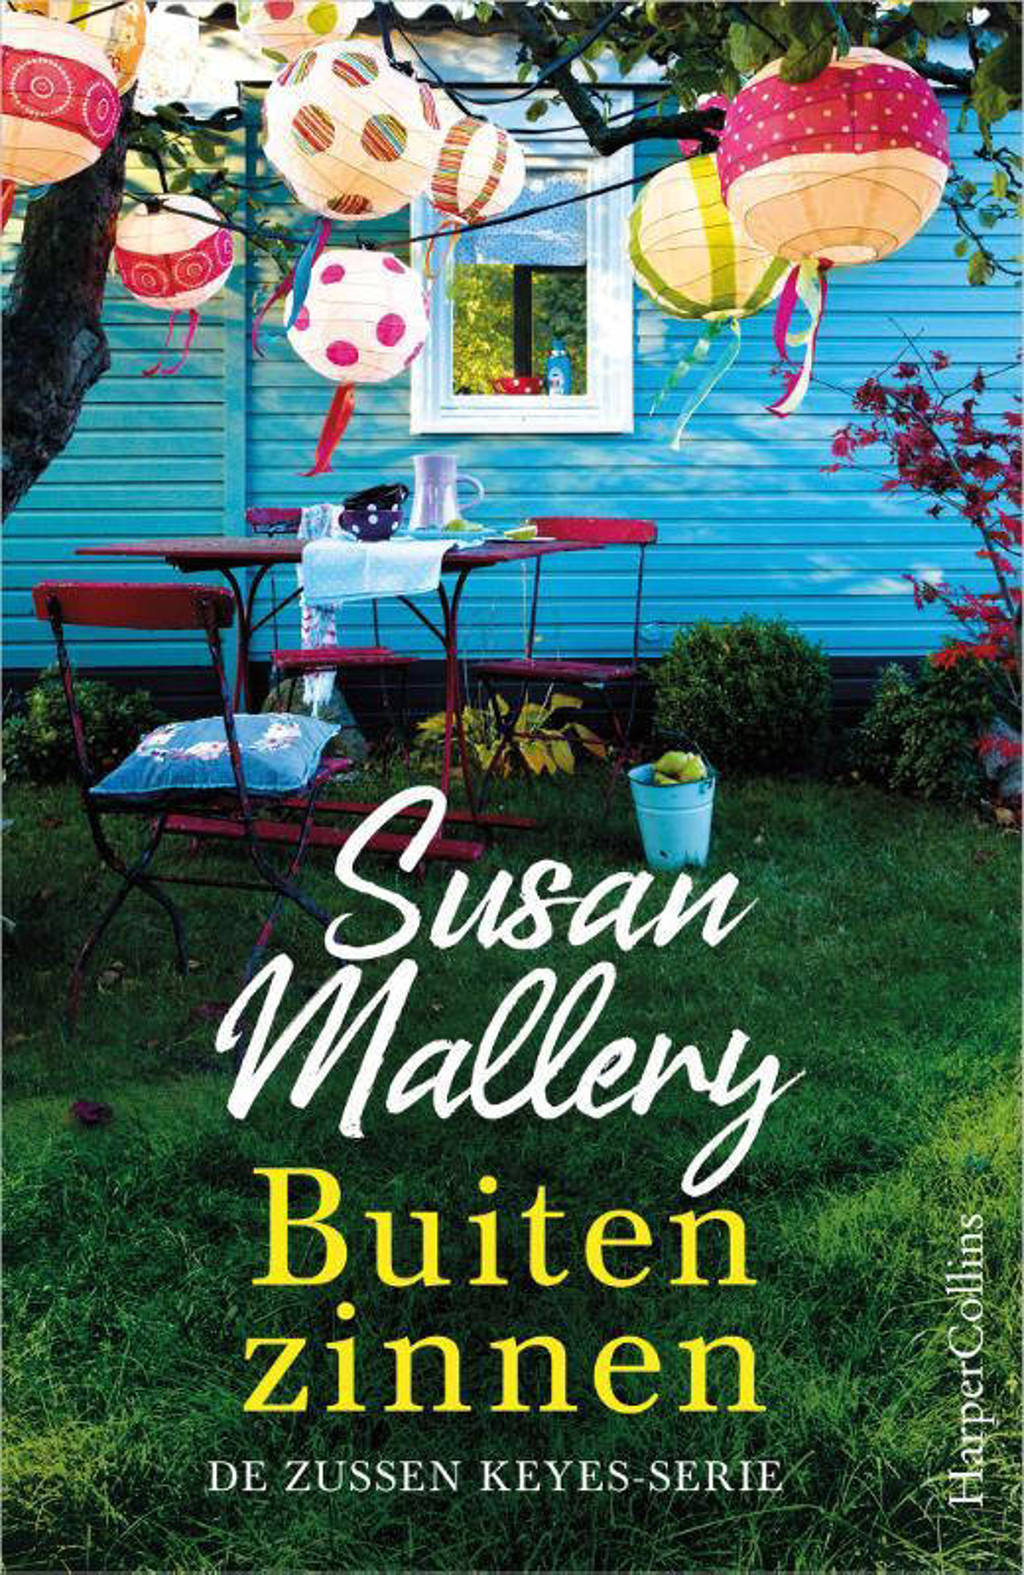 Buiten zinnen - Susan Mallery